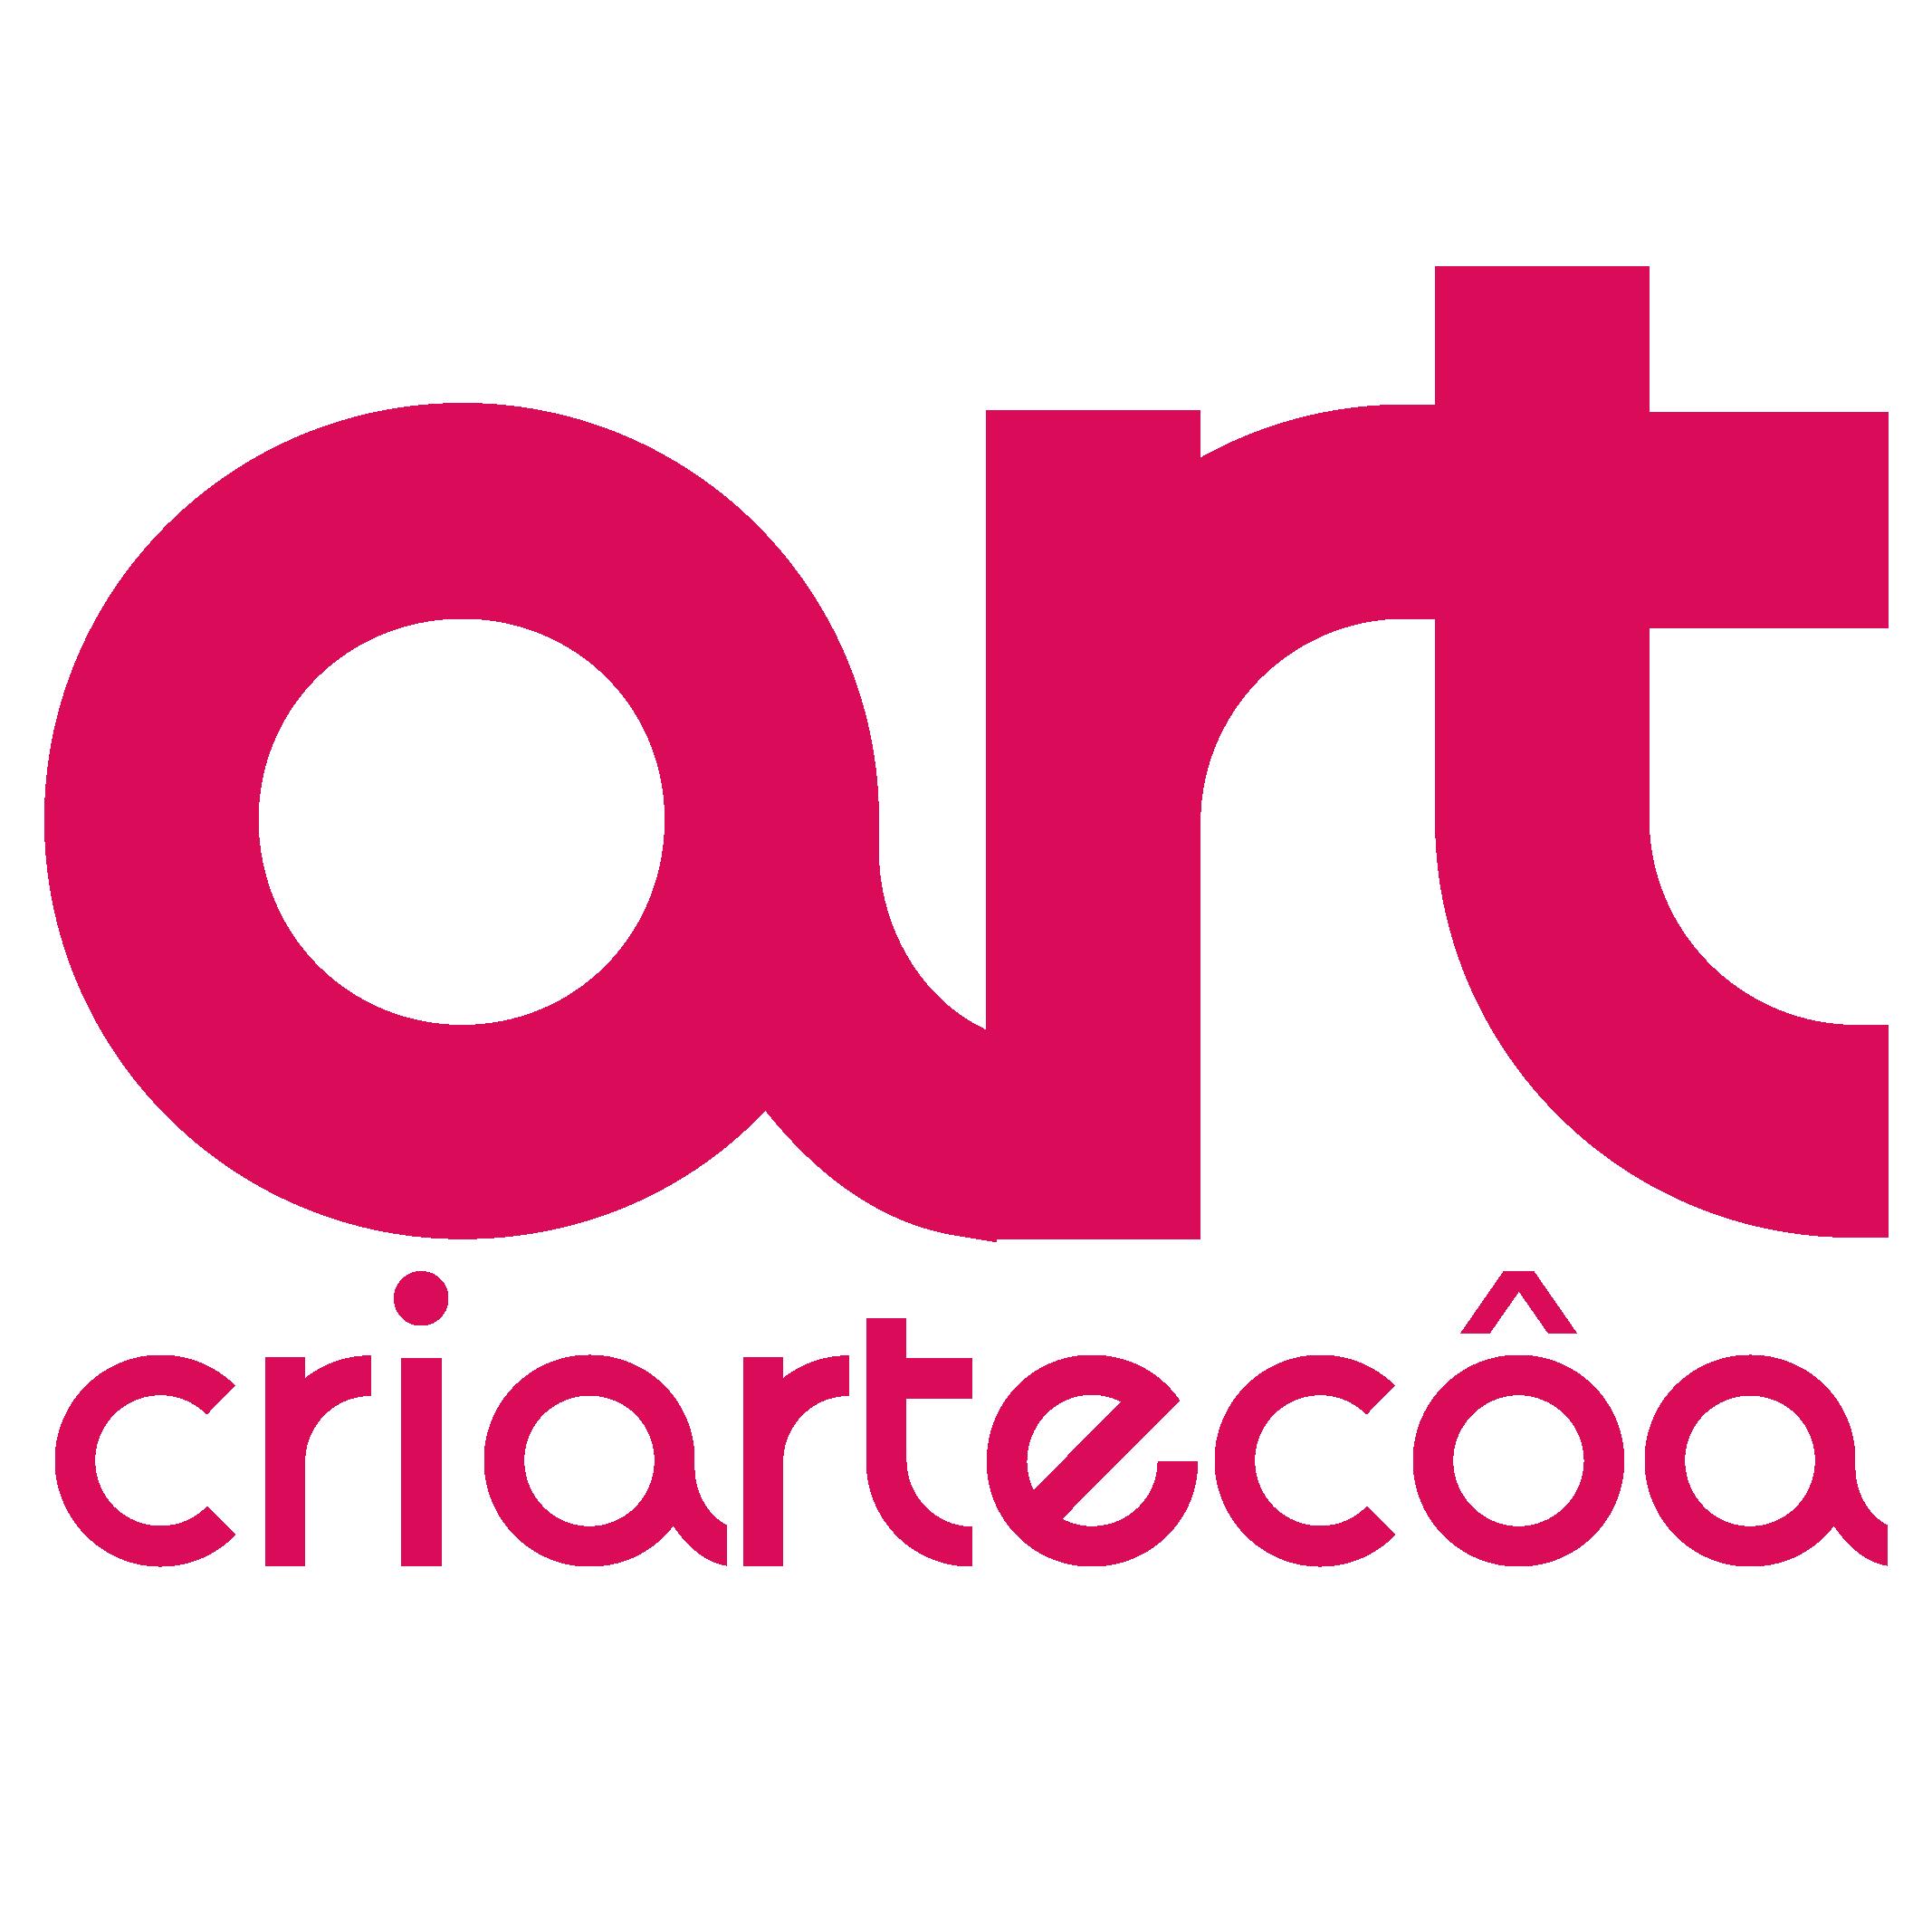 Criartecôa